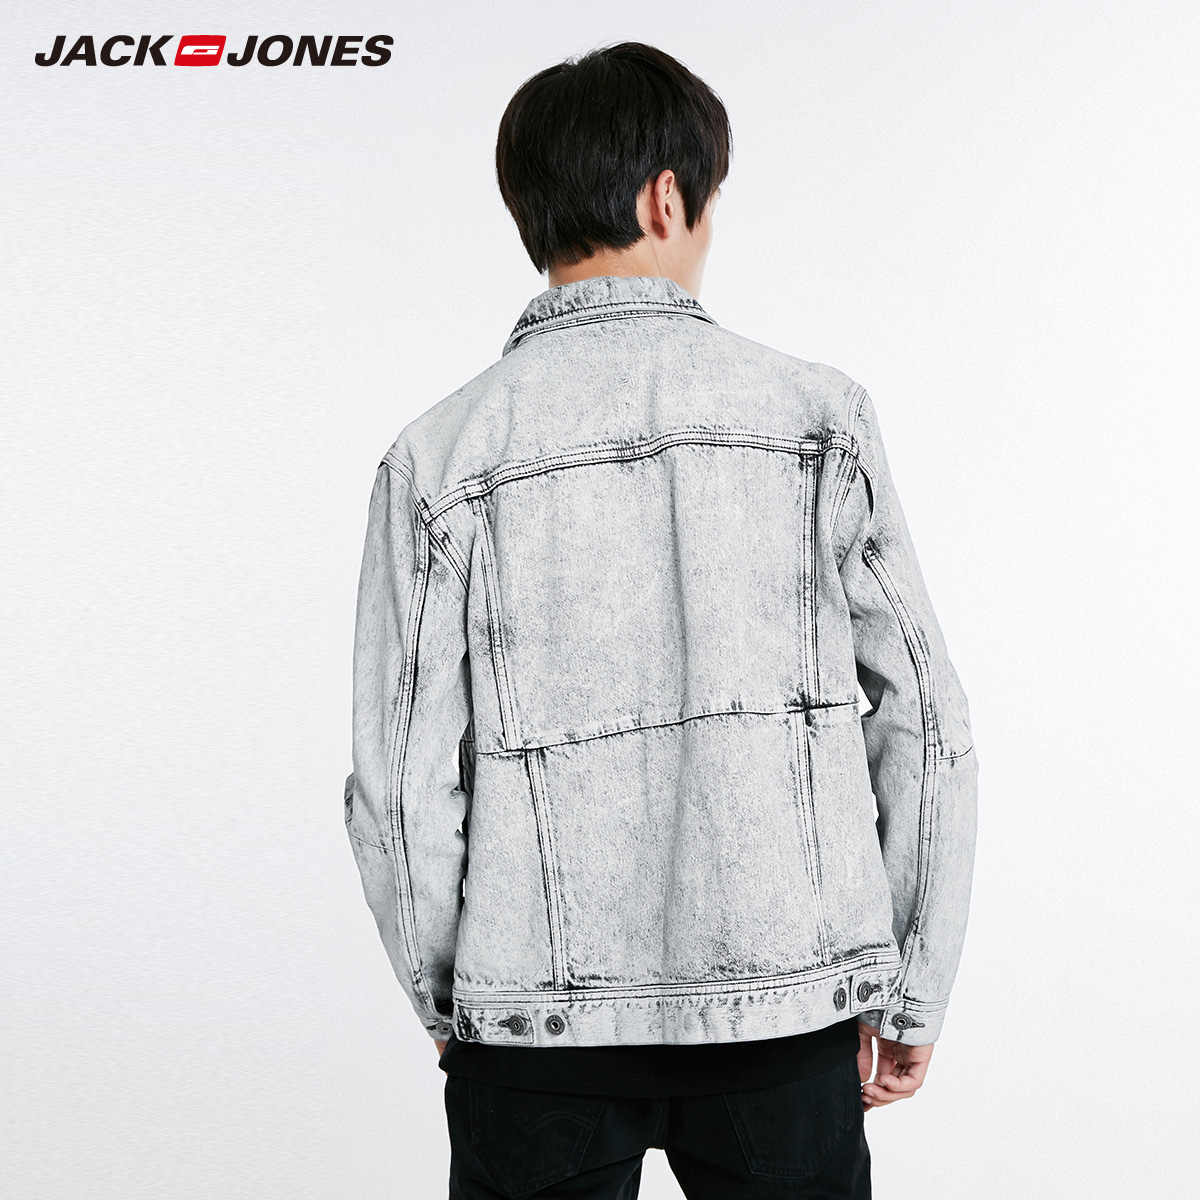 Jack Jones New Nam Retro Denim Áo Khoác Áo Khoác | 218357523